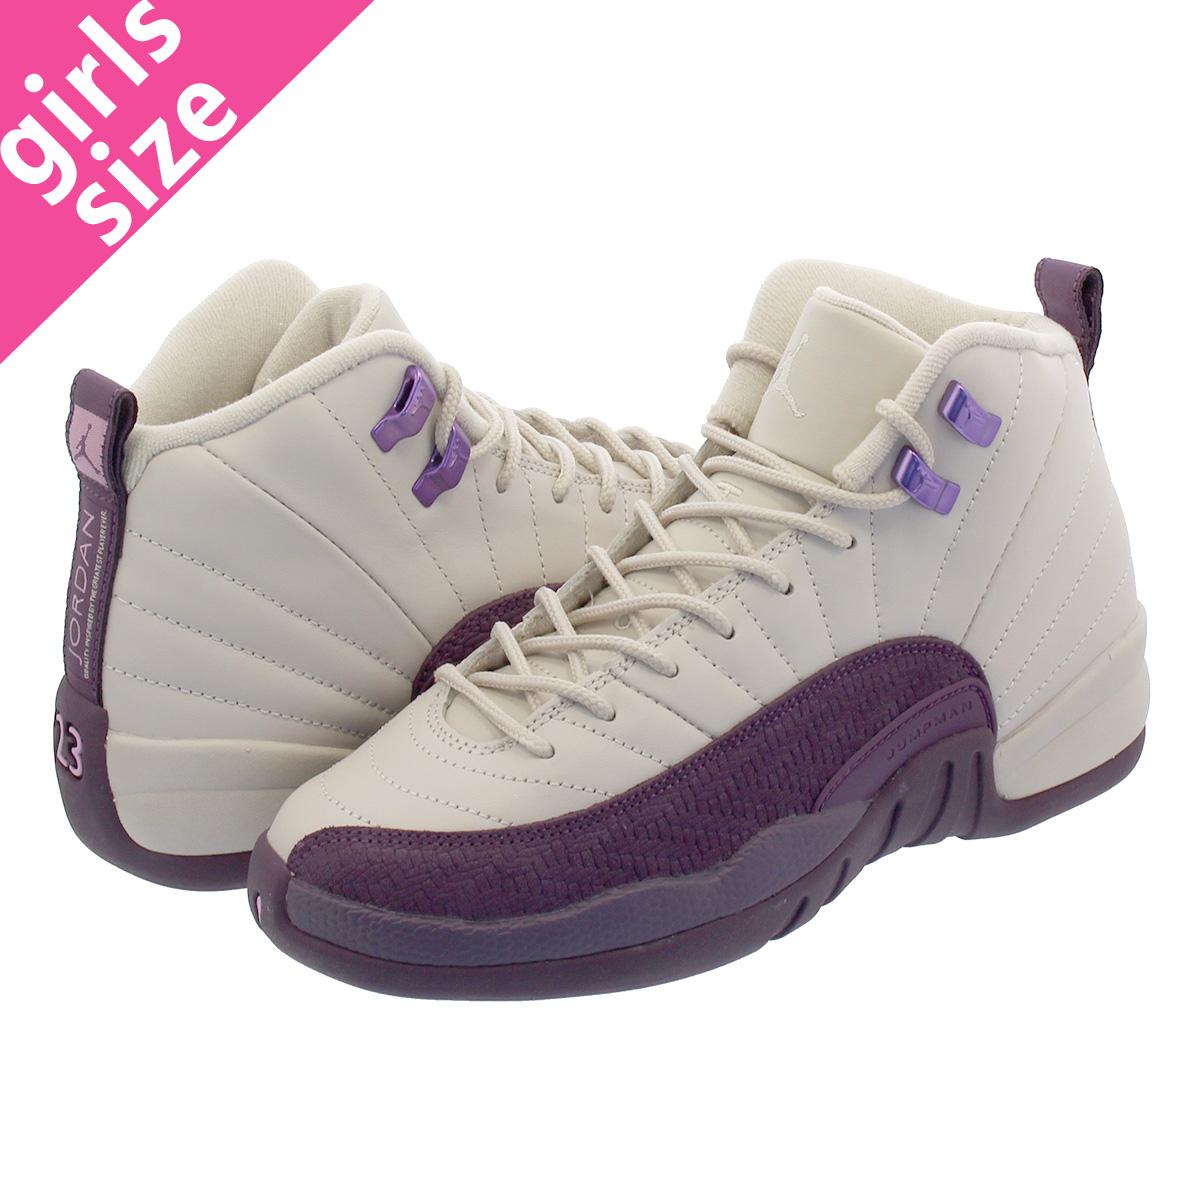 NIKE AIR JORDAN 12 RETRO GS Nike Air Jordan 12 nostalgic GS DESERT  SAND DESERT SAND PRO PURPLE 510 99c0c0b15